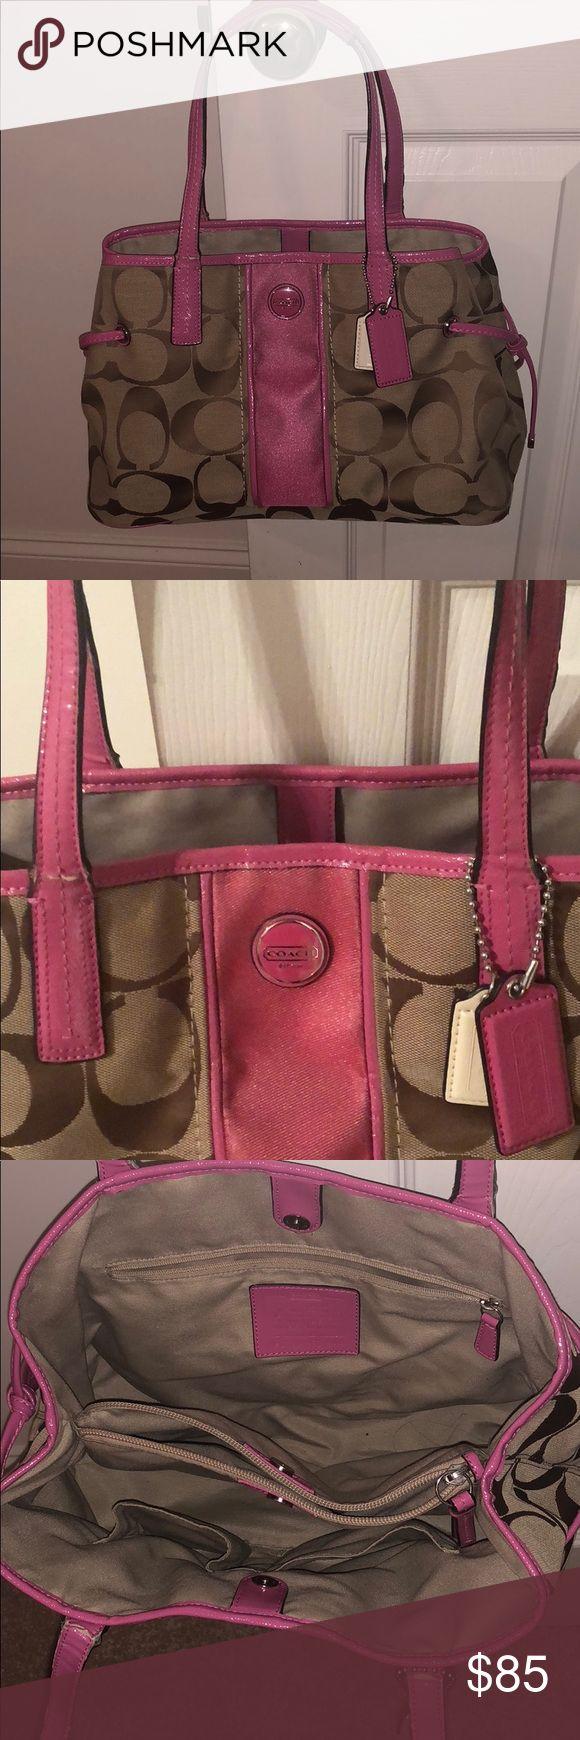 Coach Pocketbook 15 x 9  pink/ tan Coach pocket book.  Make me an offer ! Coach Bags Shoulder Bags